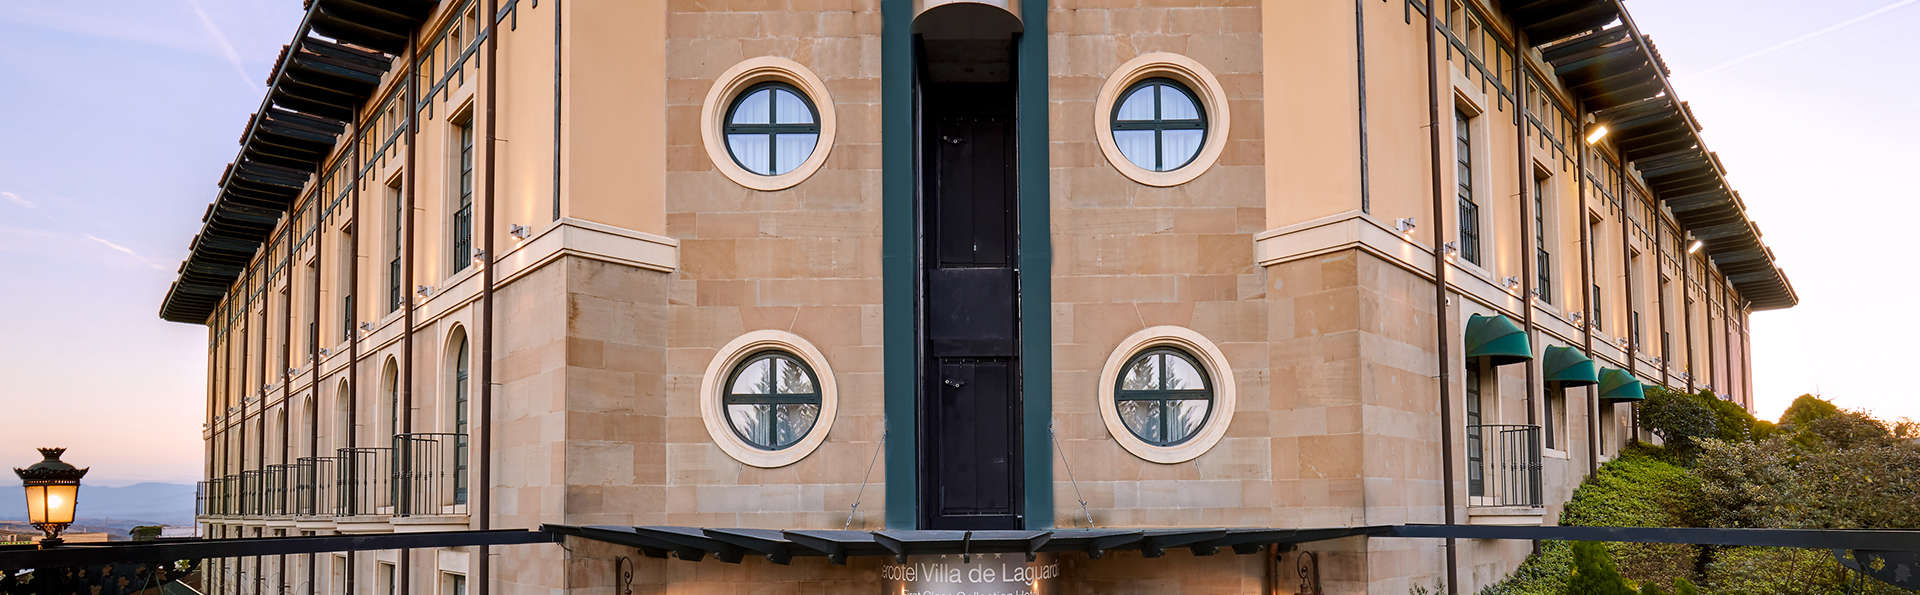 Hotel Sercotel Villa de Laguardia - Edit_Front2.jpg